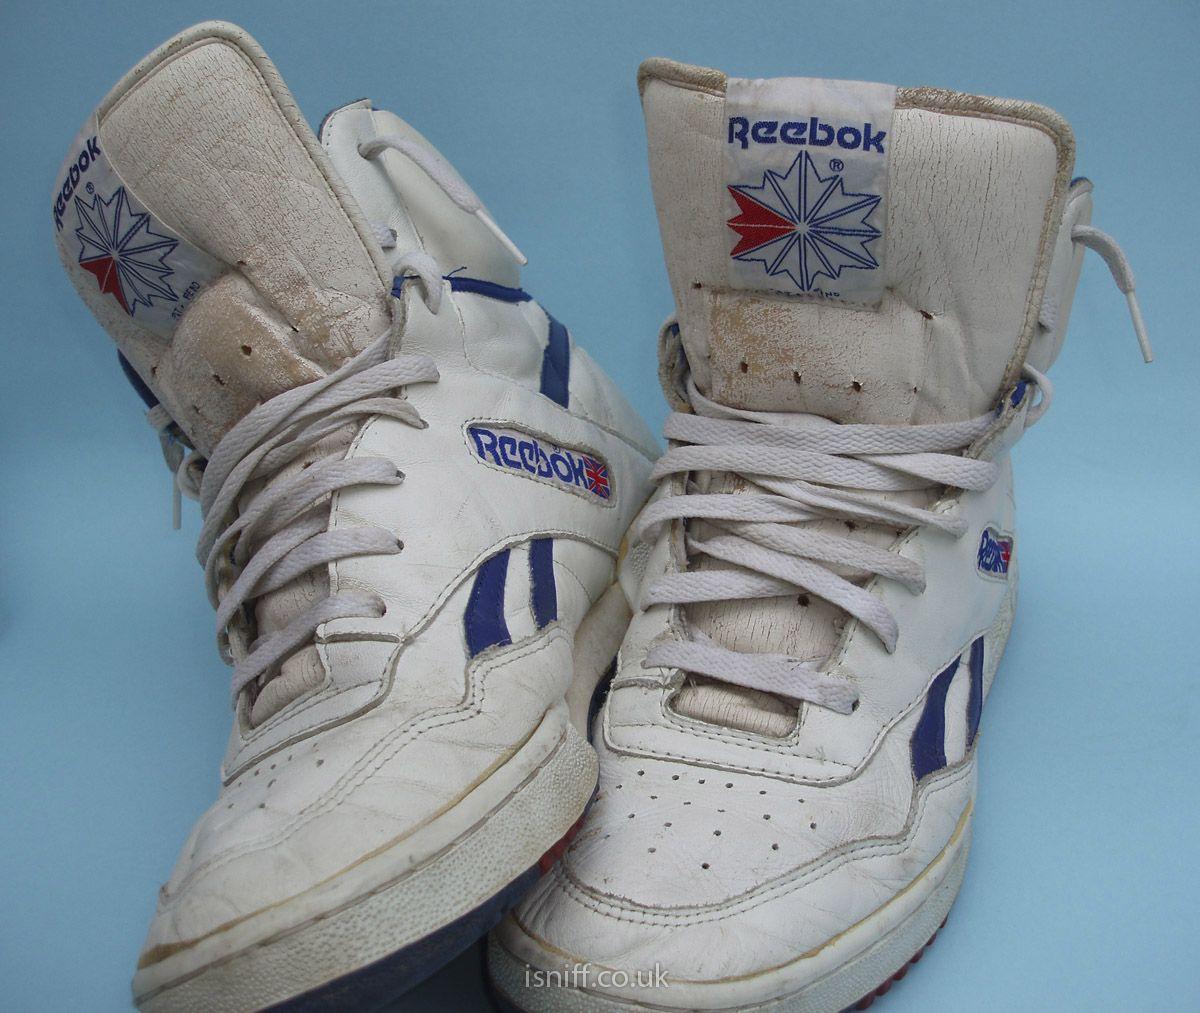 bb4600_white_15.jpg (1200×1013) | Vintage sneakers, White